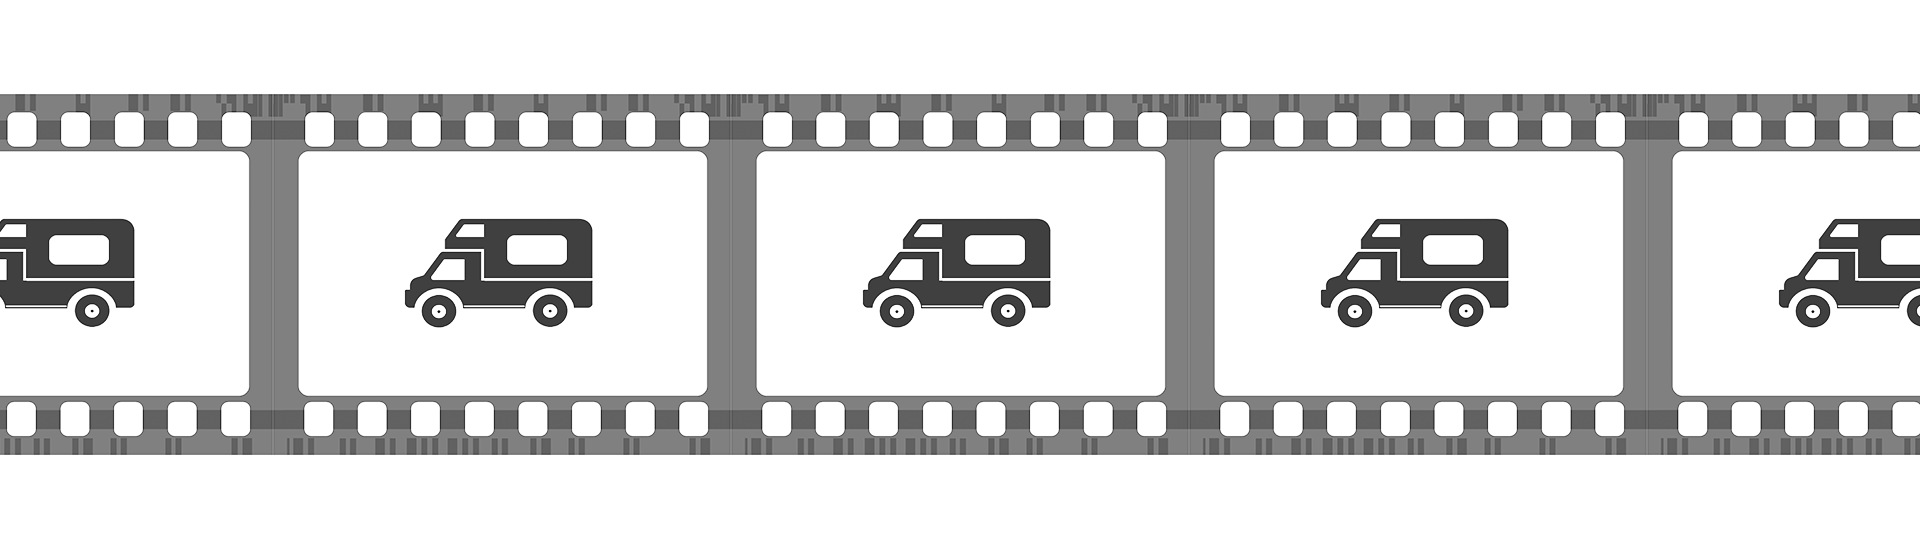 rv film roll